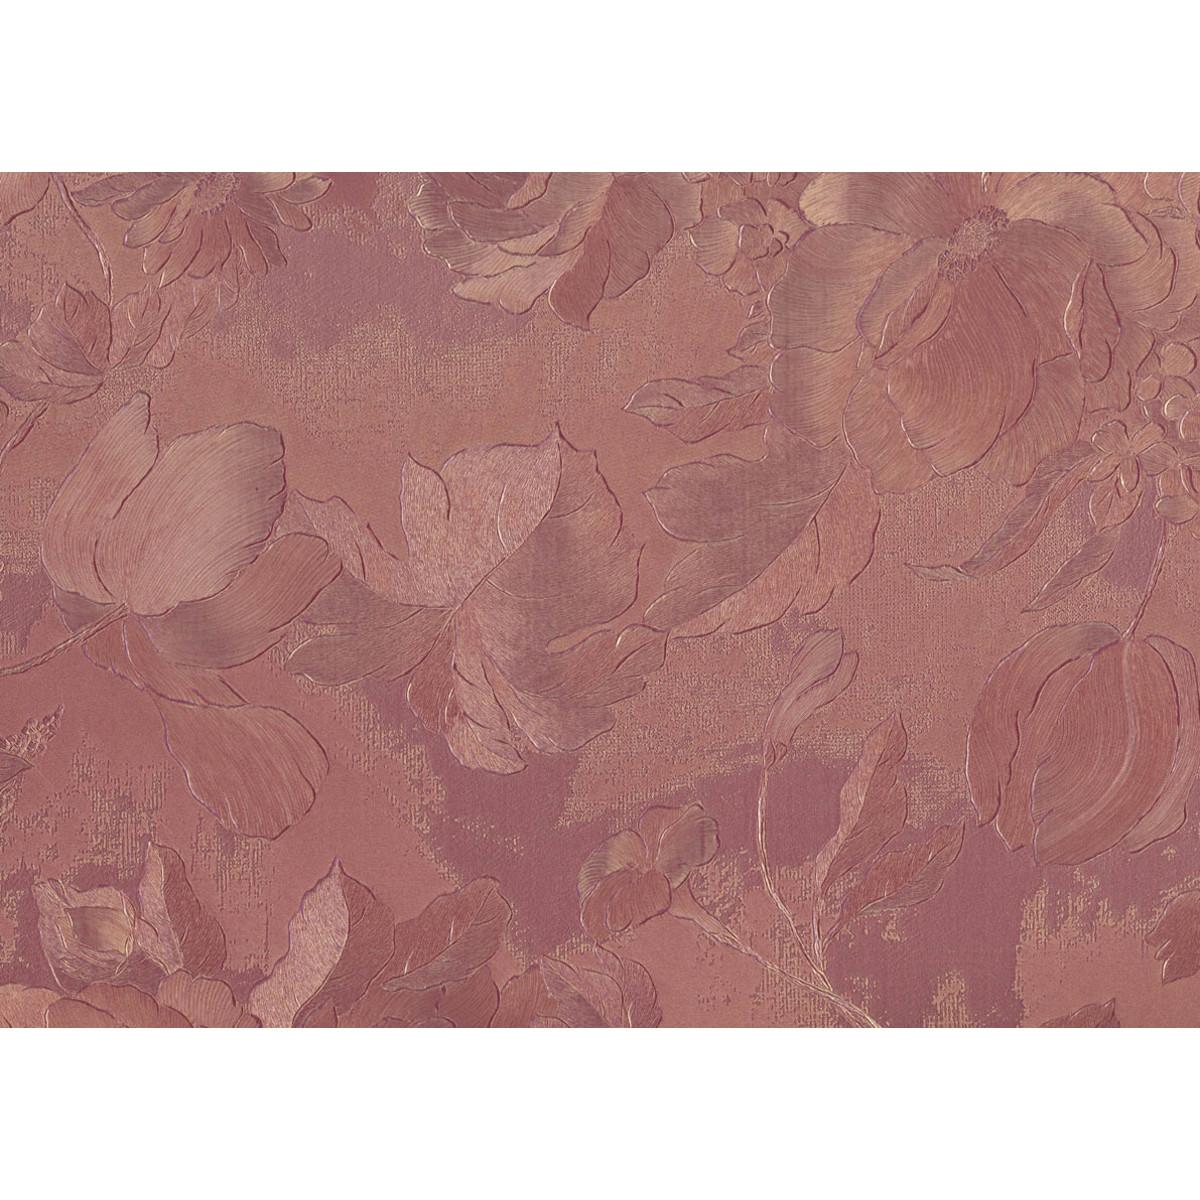 Обои виниловые Sirpi ITALIAN CHIC розовые 0.53 м 1VF 24445